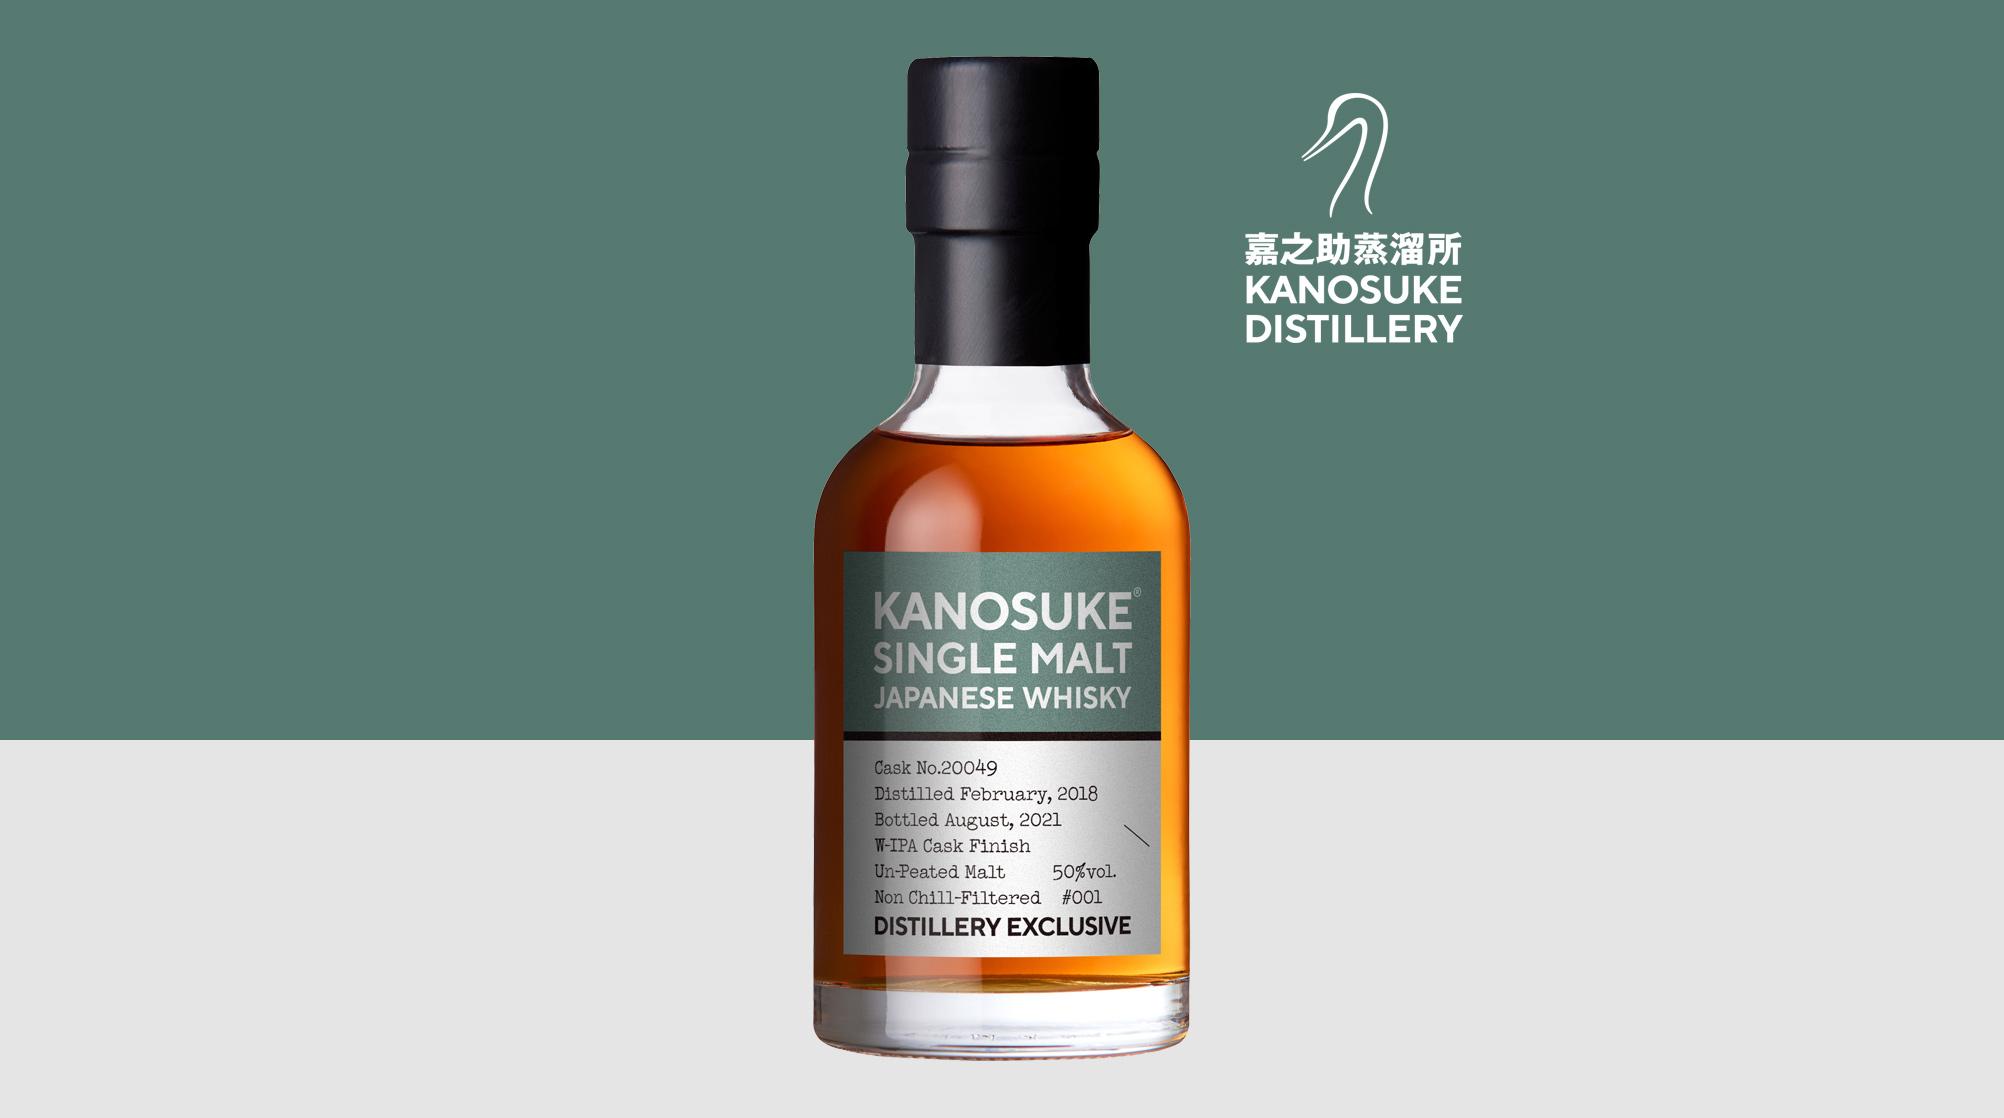 SINGLE MALT KANOSUKE DISTILLERY EXCLUSIVE BOTTLE